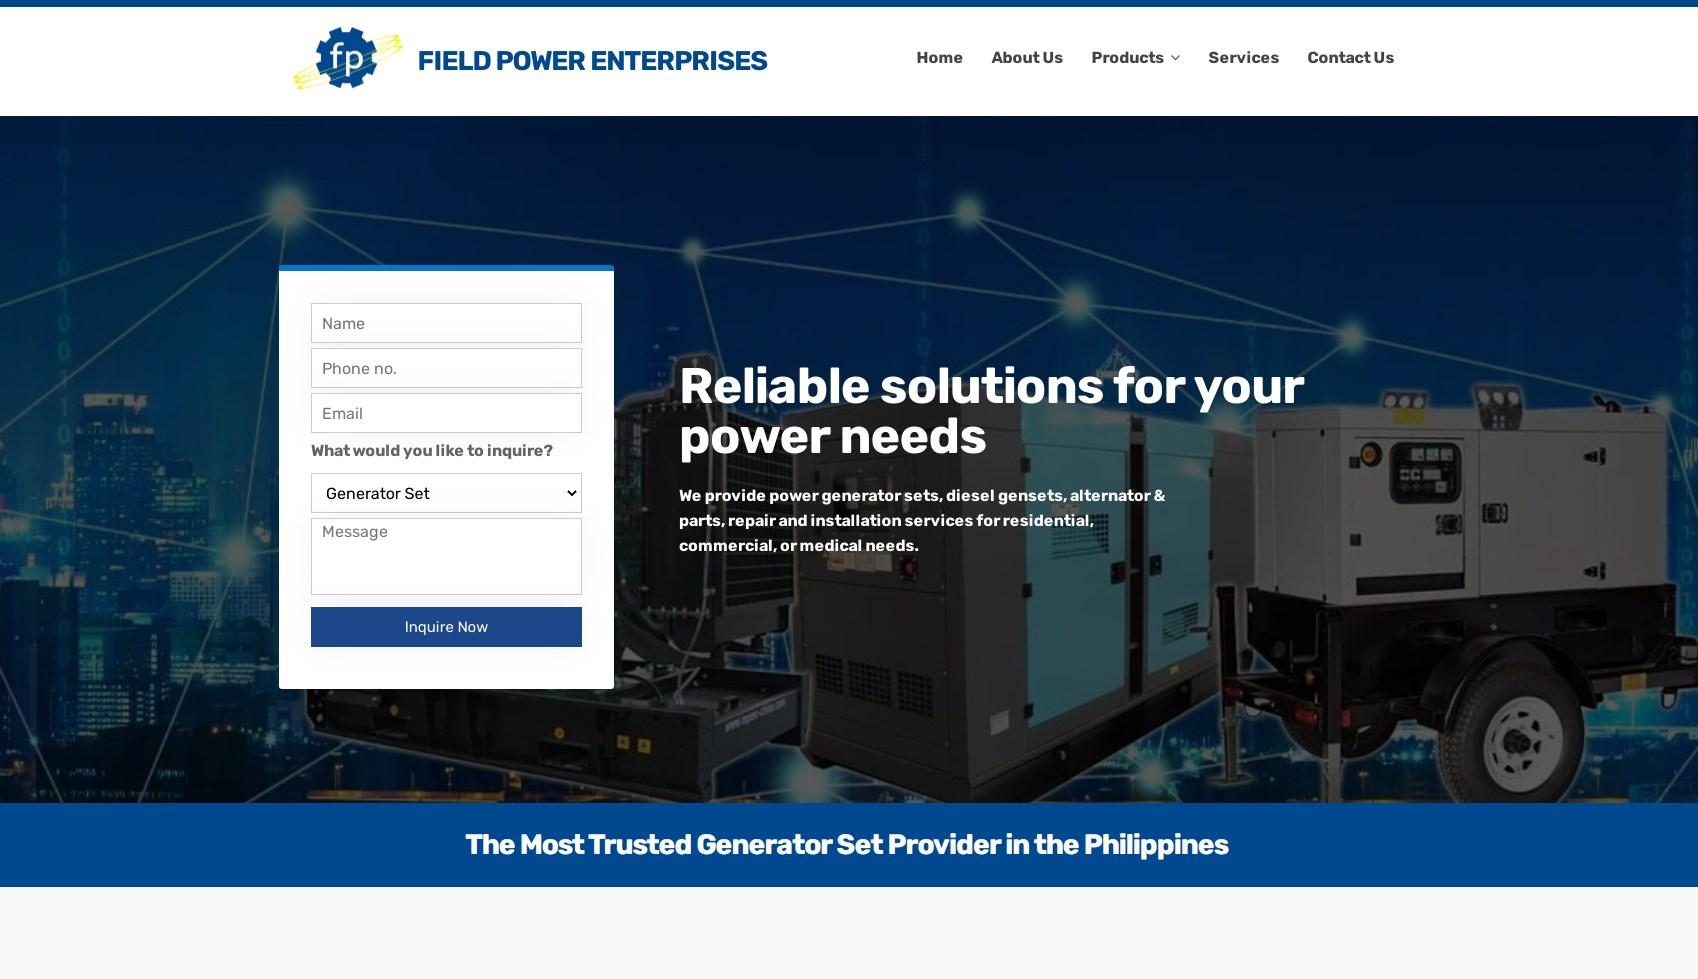 Field Power Enterprises, Philippines